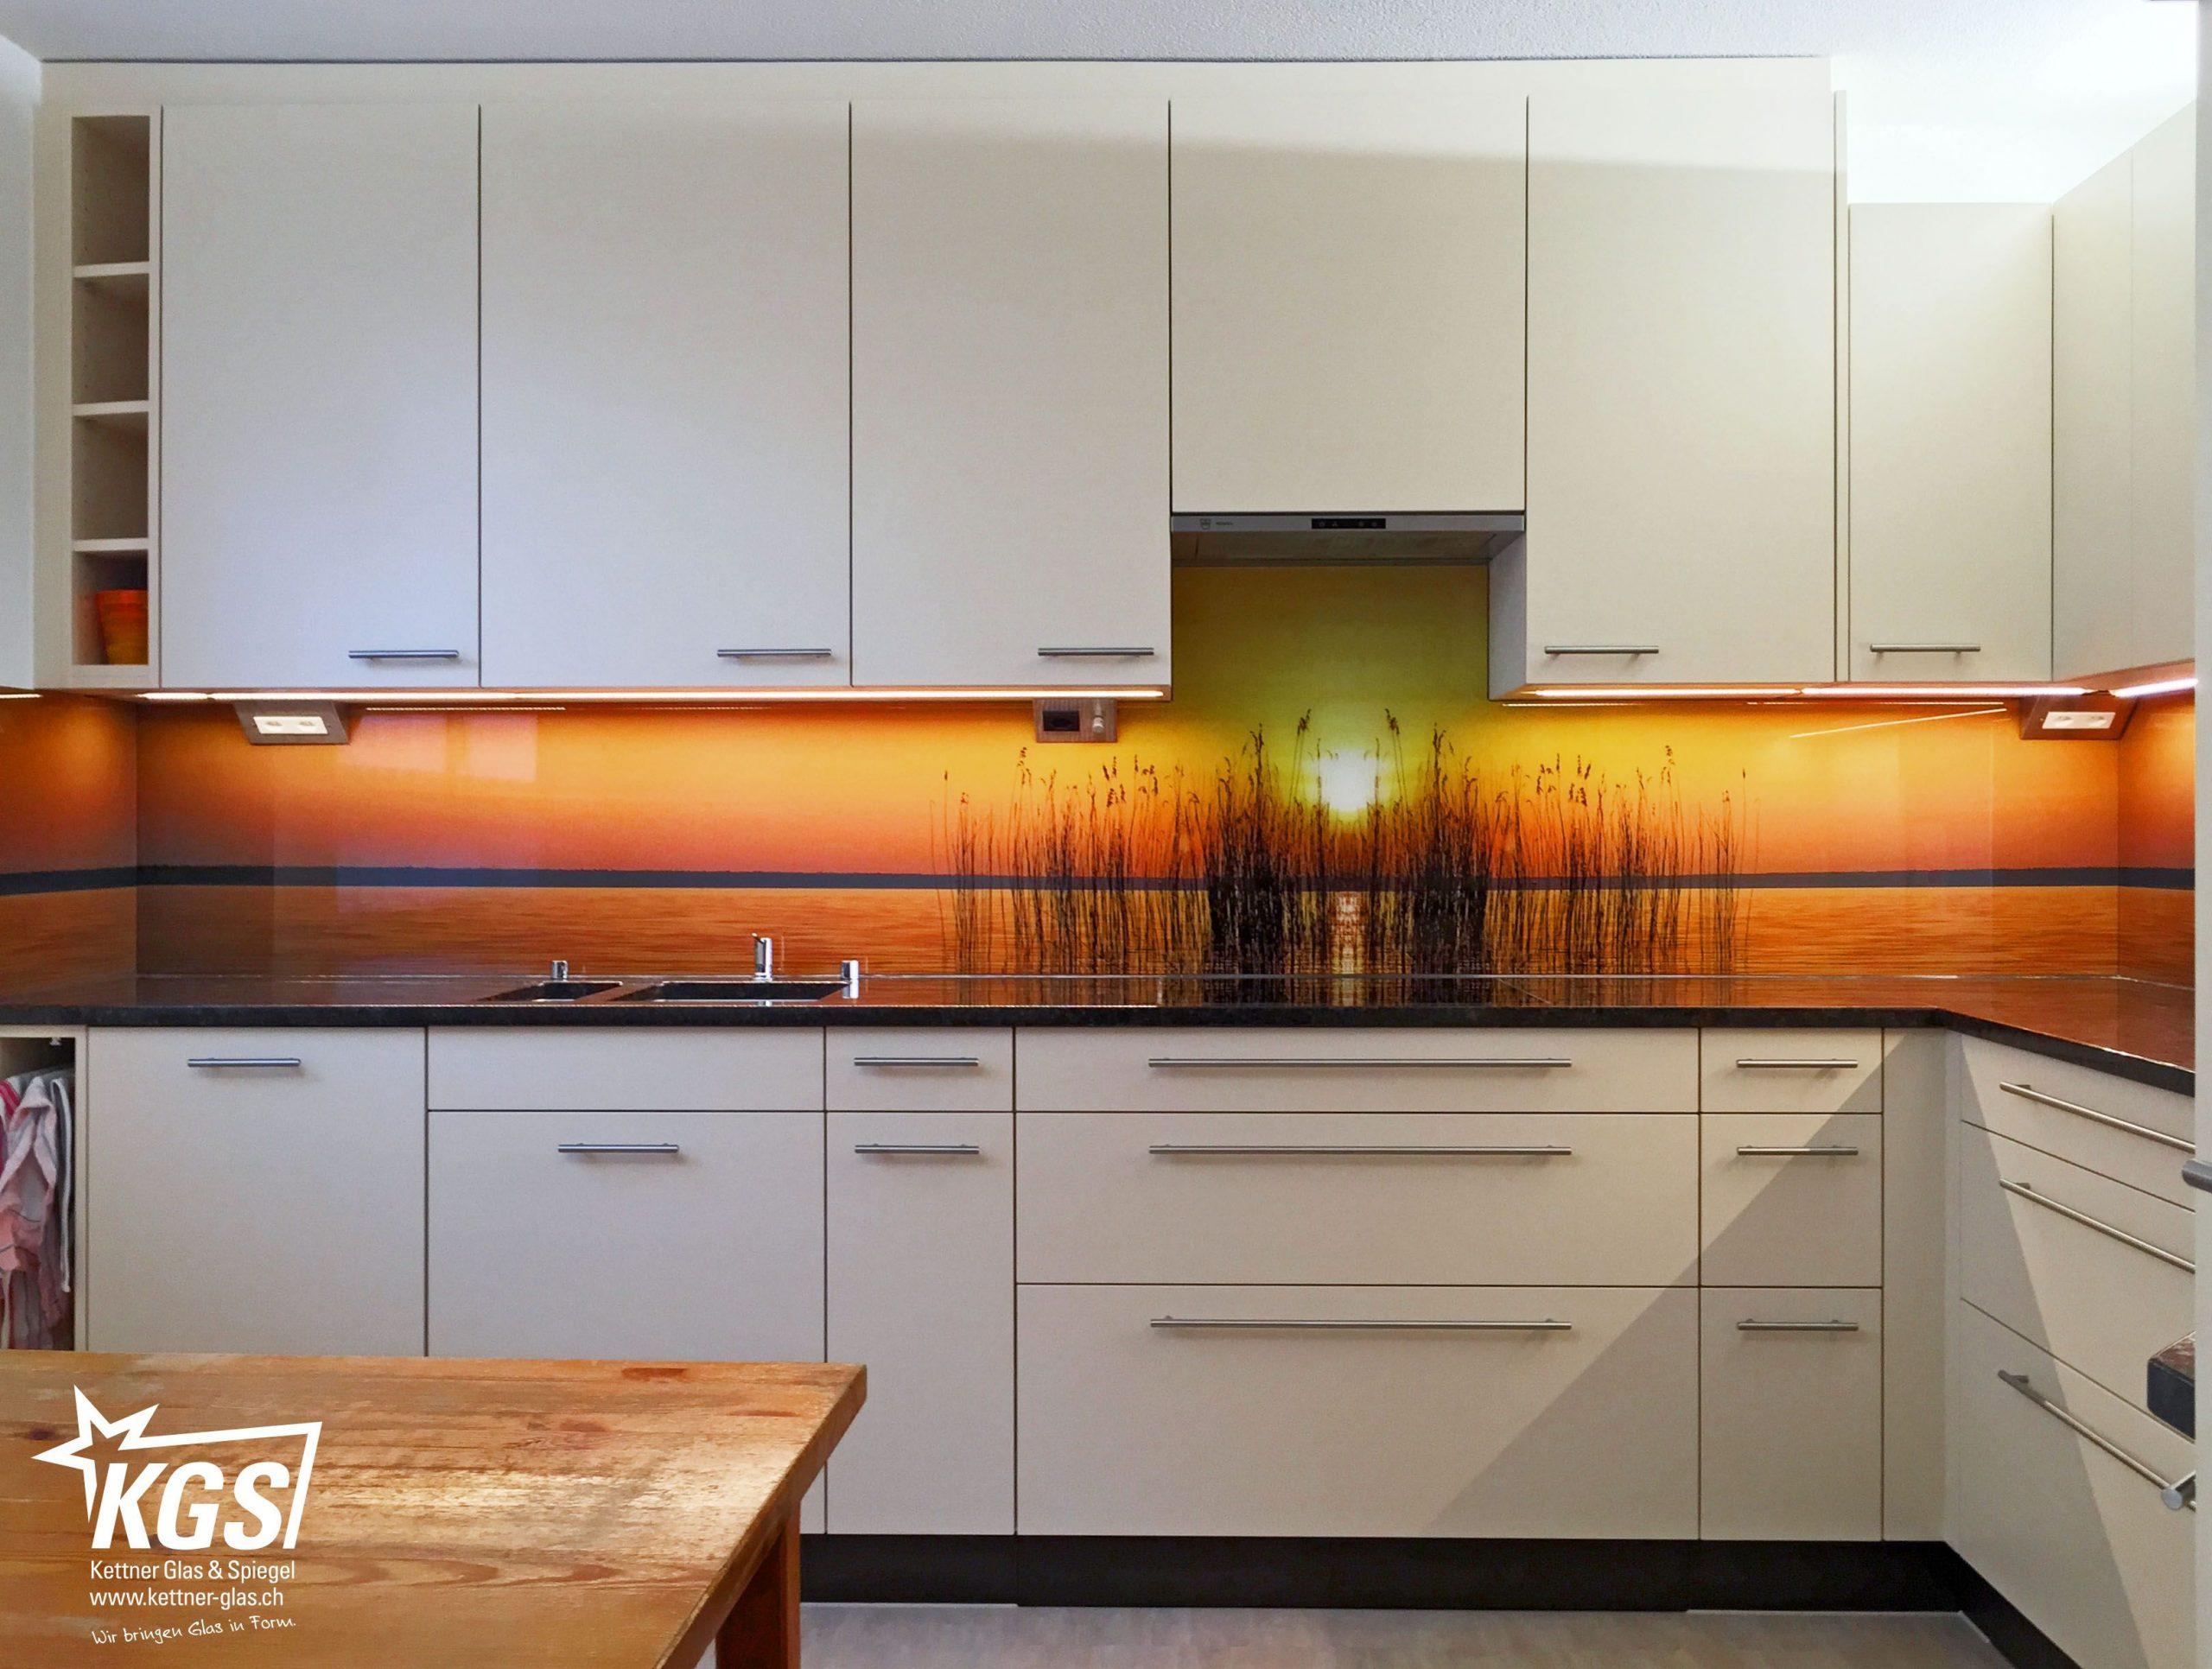 Full Size of Glaswand Küche Kosten Glaswand Küche Spritzschutz Glaswand Küche Wohnzimmer Glaswand Küche Reinigen Küche Glaswand Küche